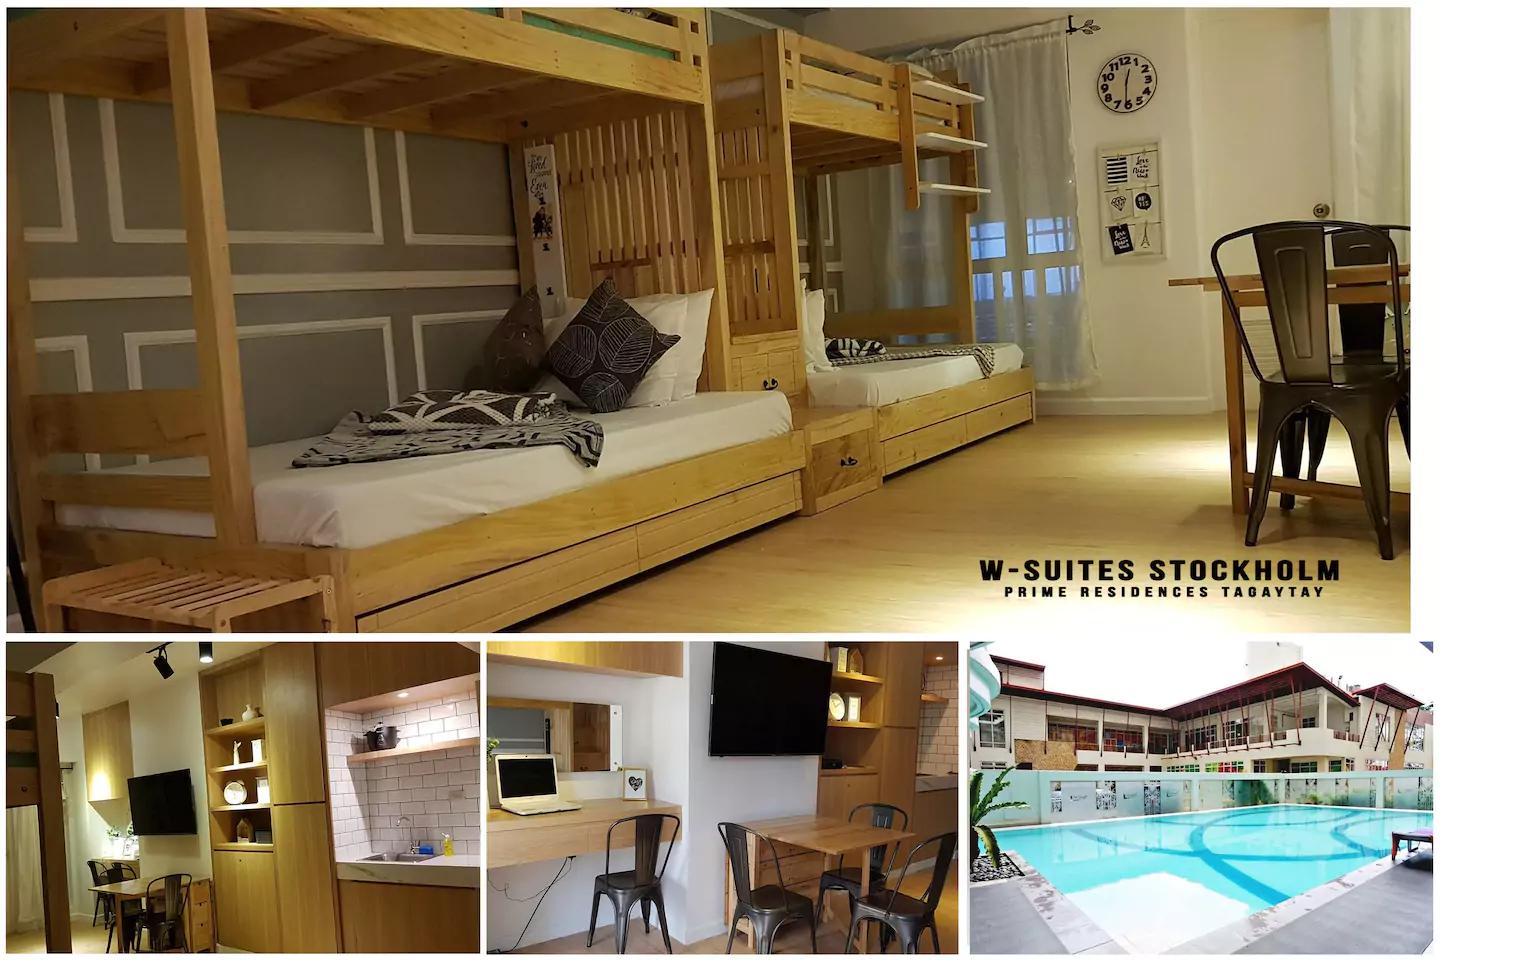 W-Suites Bnew Stockholm w/ xbox, videoke & pool